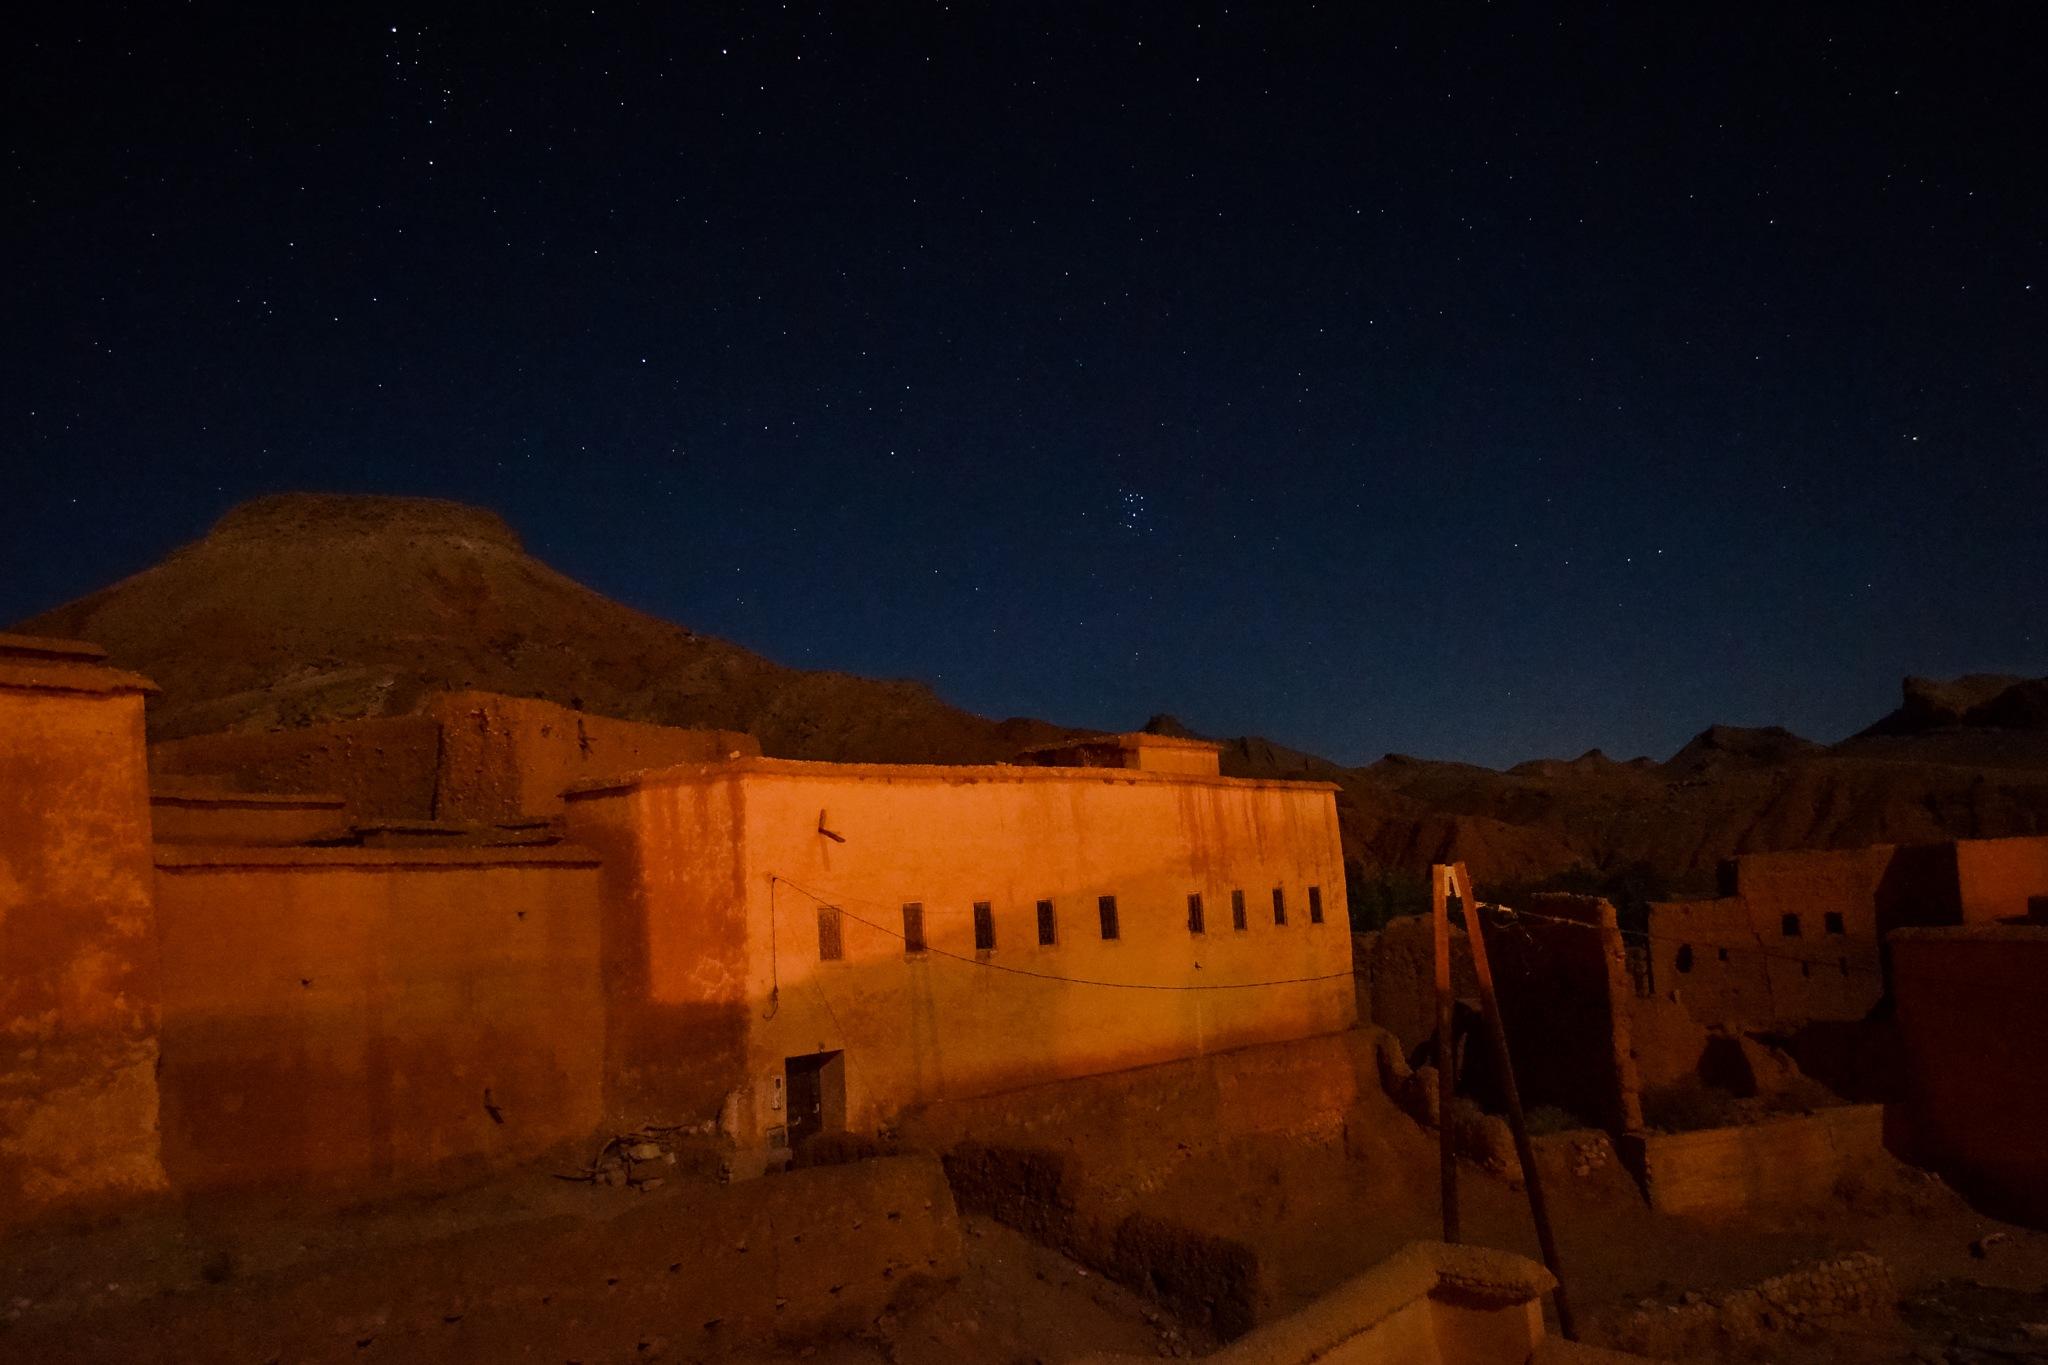 thr night by Abderrahim Ouaya Oubrahim